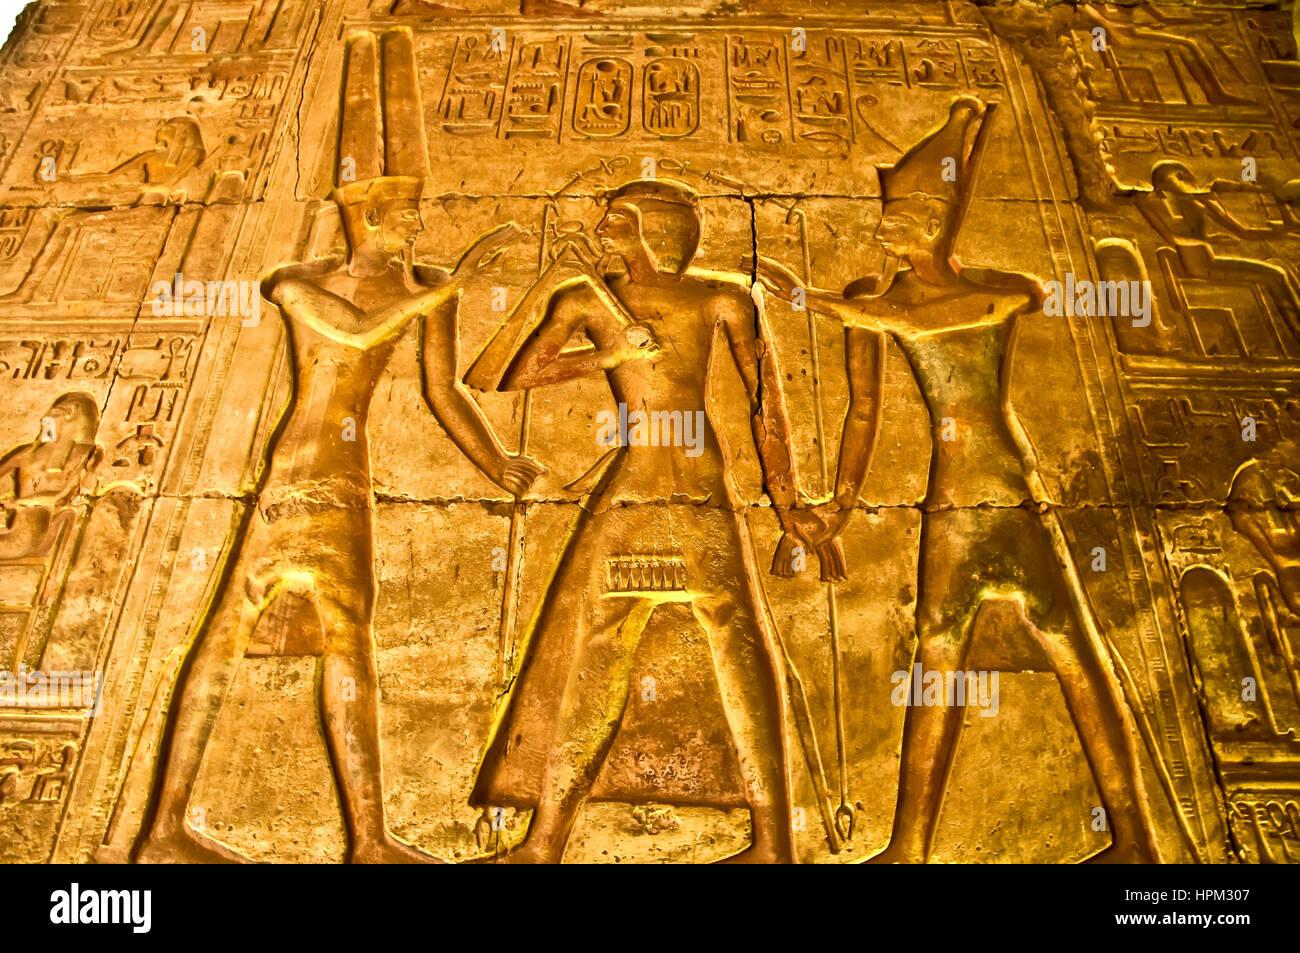 Temple of Seti I at Abydos illuminated wall with pharonic figures and numerous hieroglyphs - Stock Image